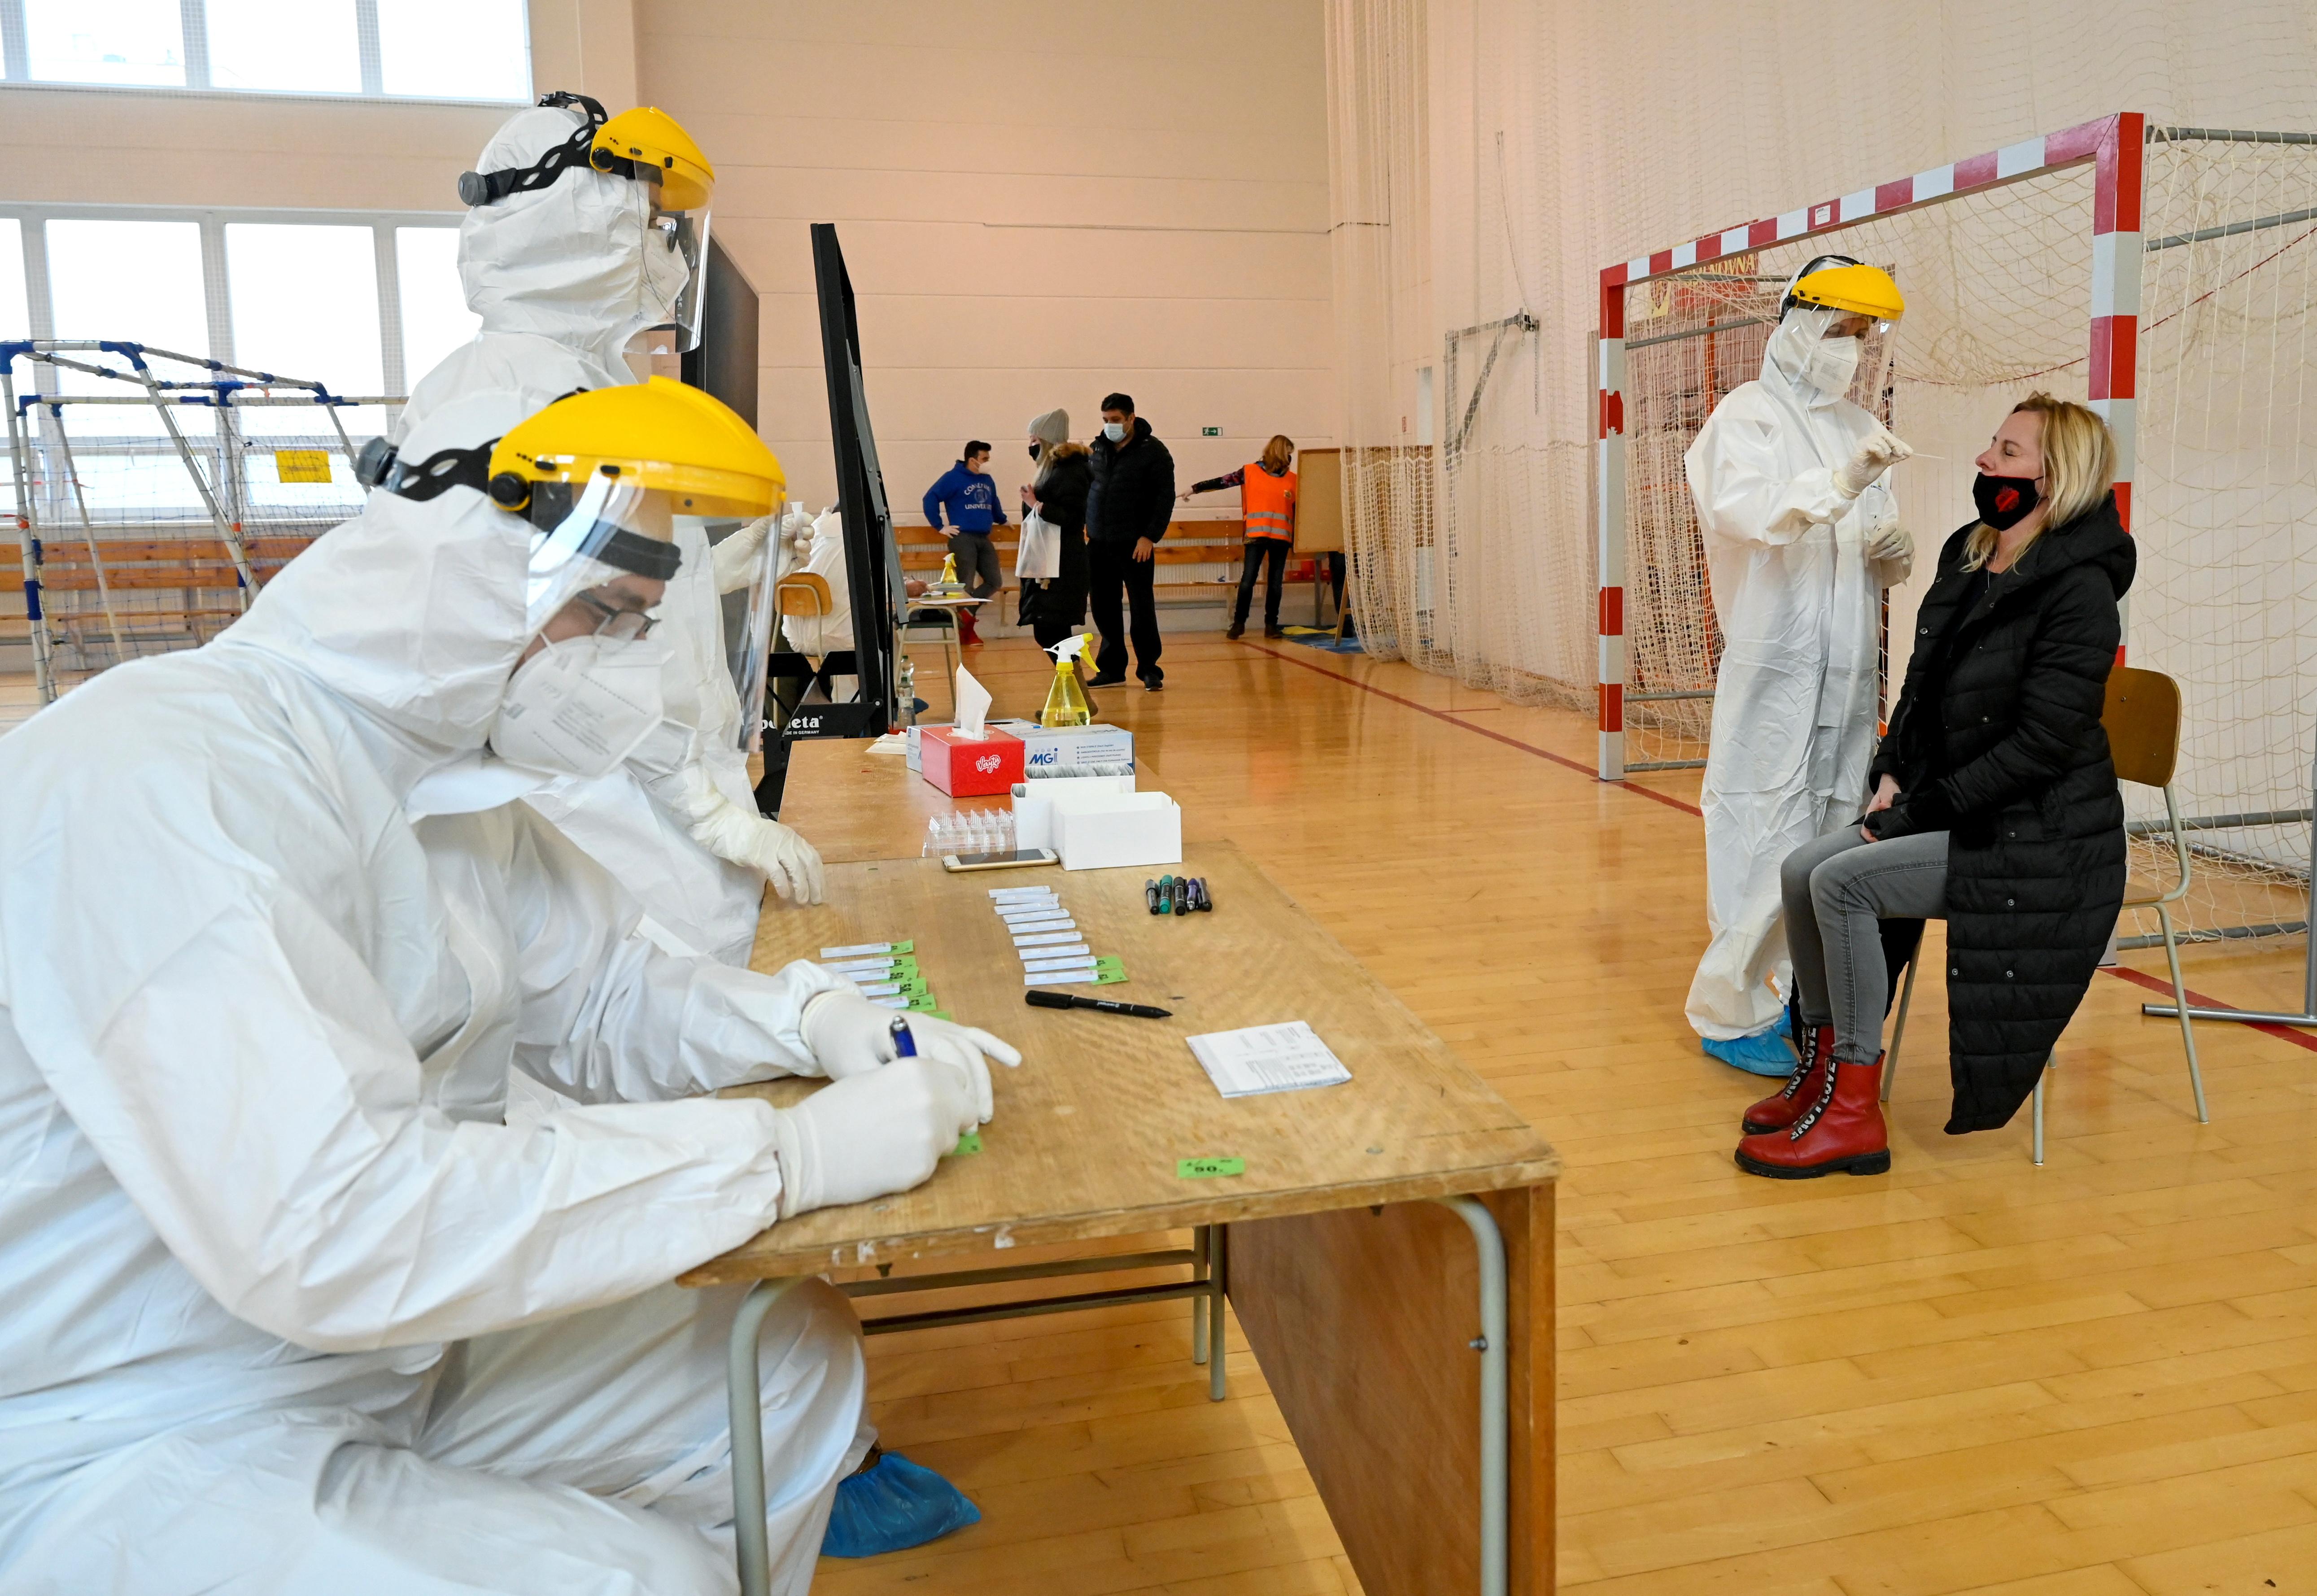 Polish healthcare workers (L) help during a mass nationwide testing for coronavirus disease (COVID-19) in Zilina, Slovakia, January 23, 2021. REUTERS/Radovan Stoklasa/File Photo